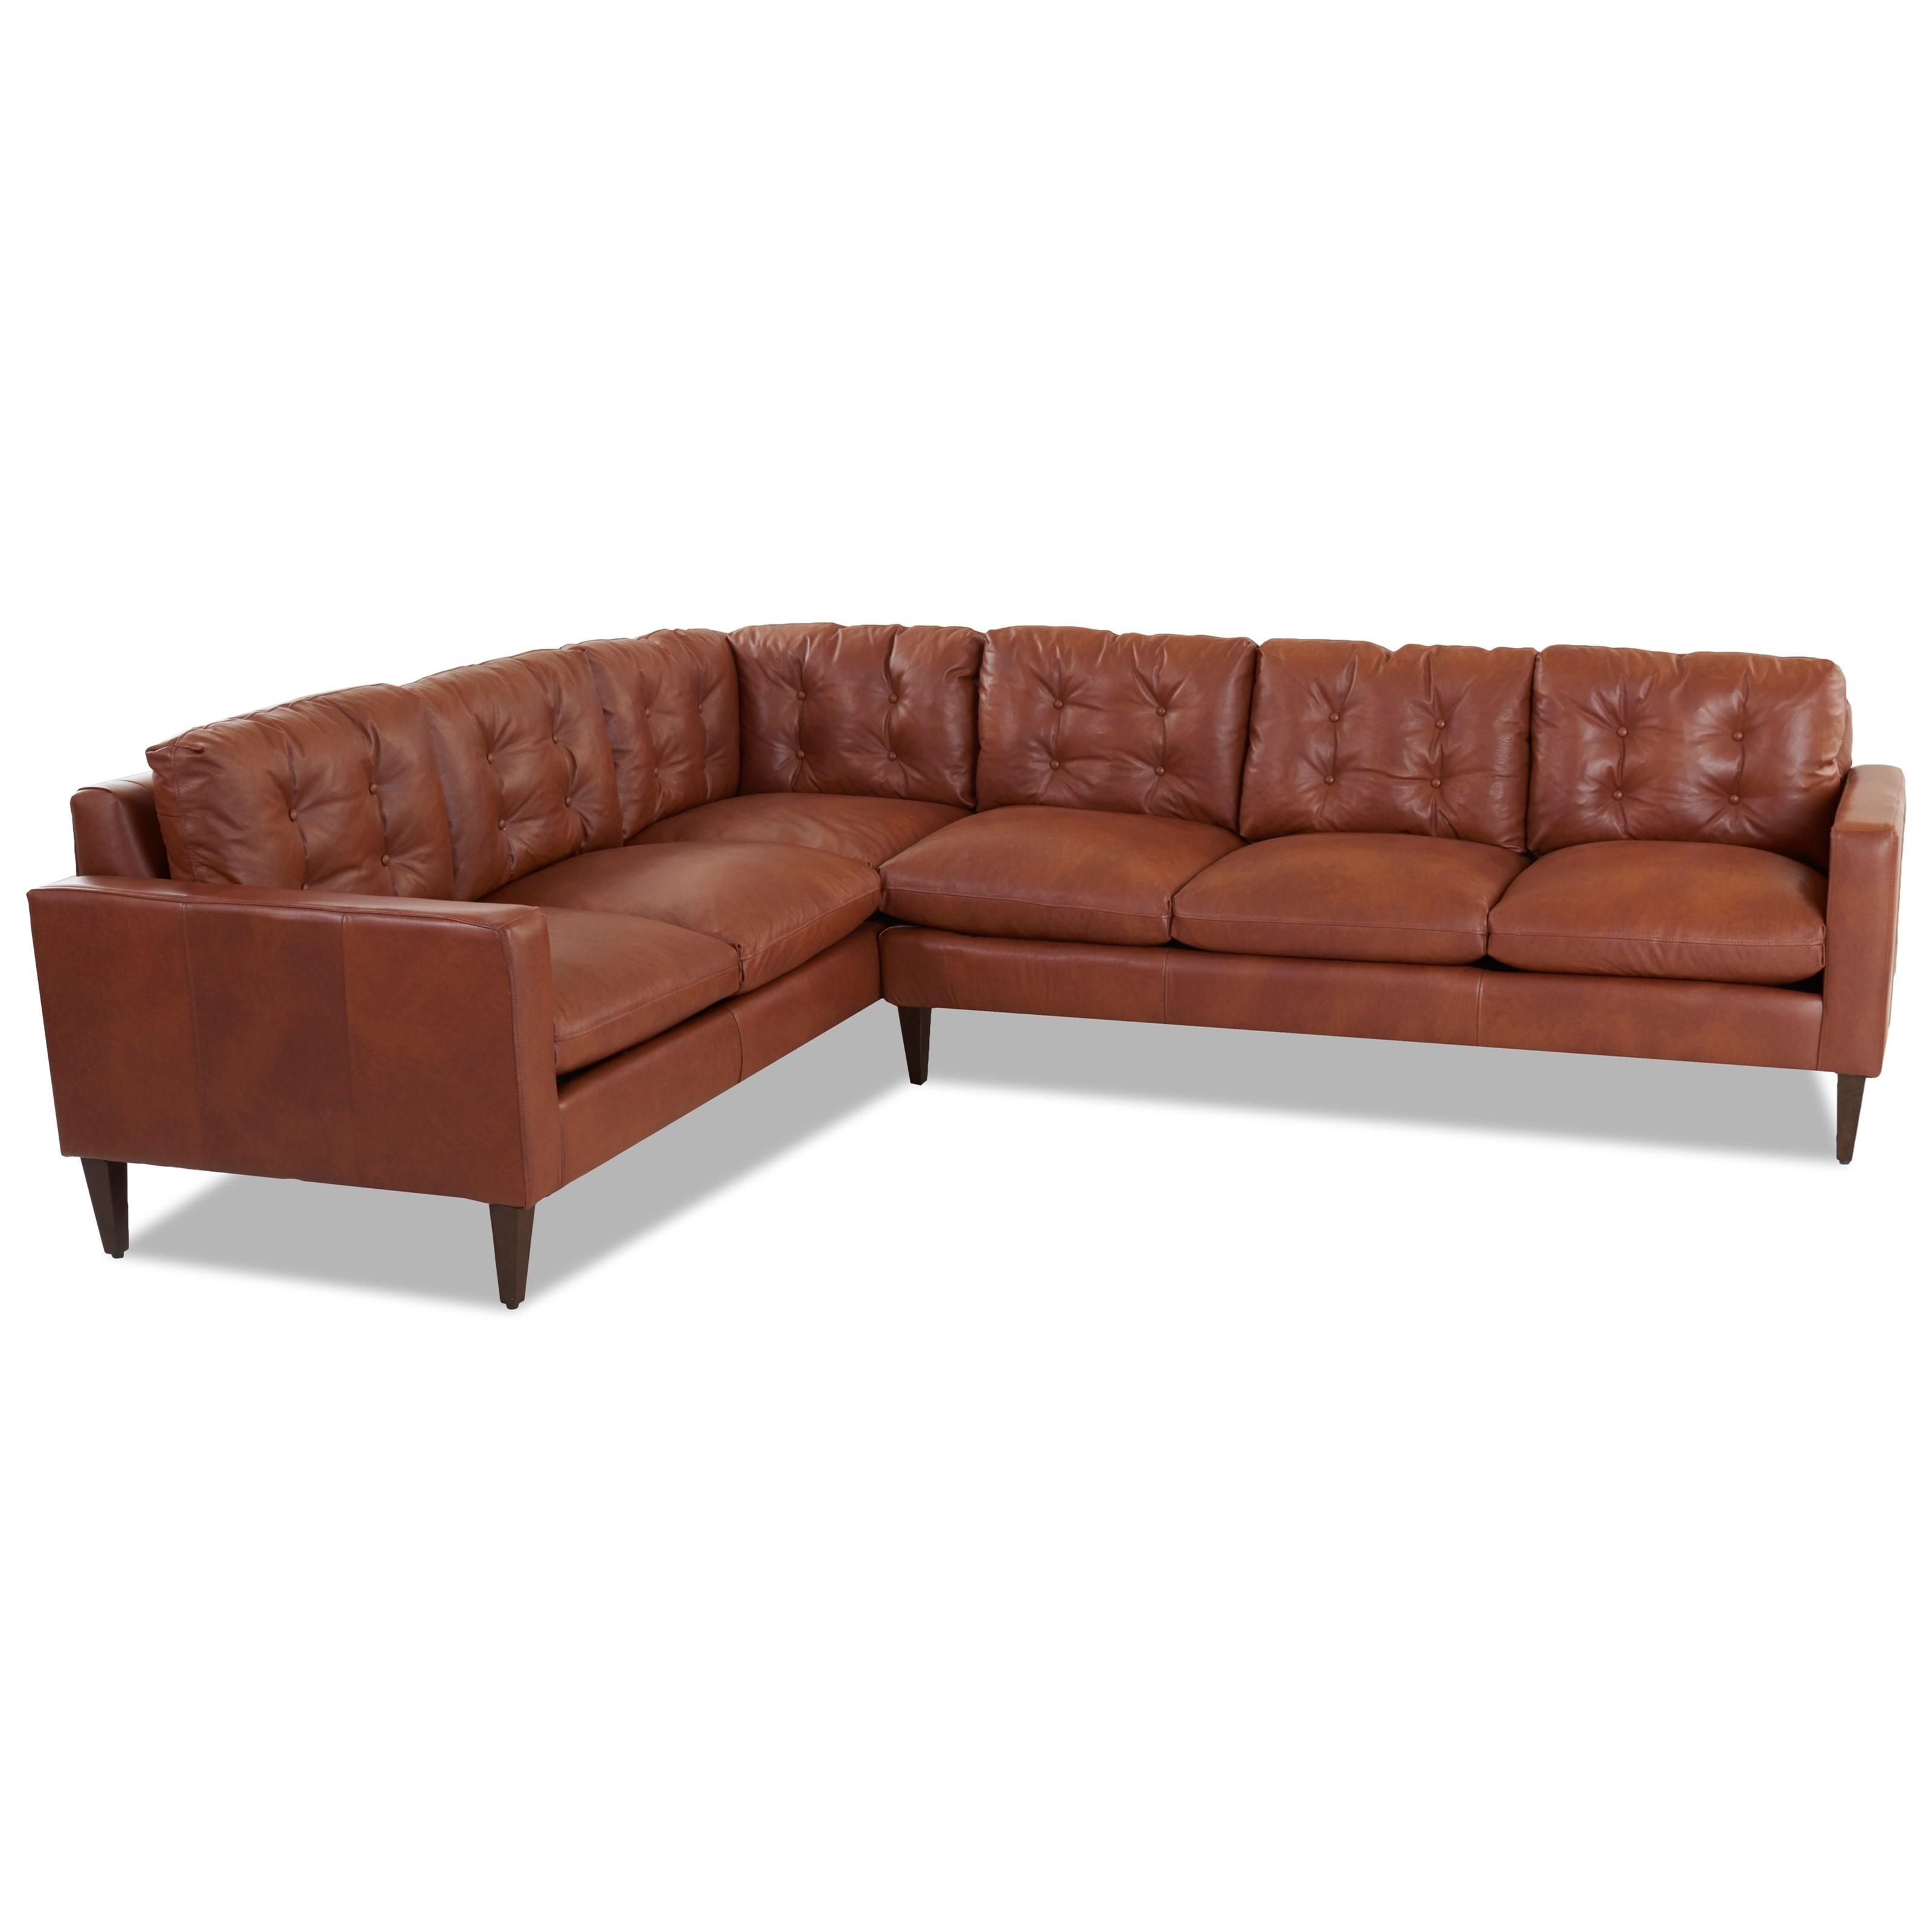 Mid Century Modern Sectional Sofa with Left Arm Facing Corner Sofa ...